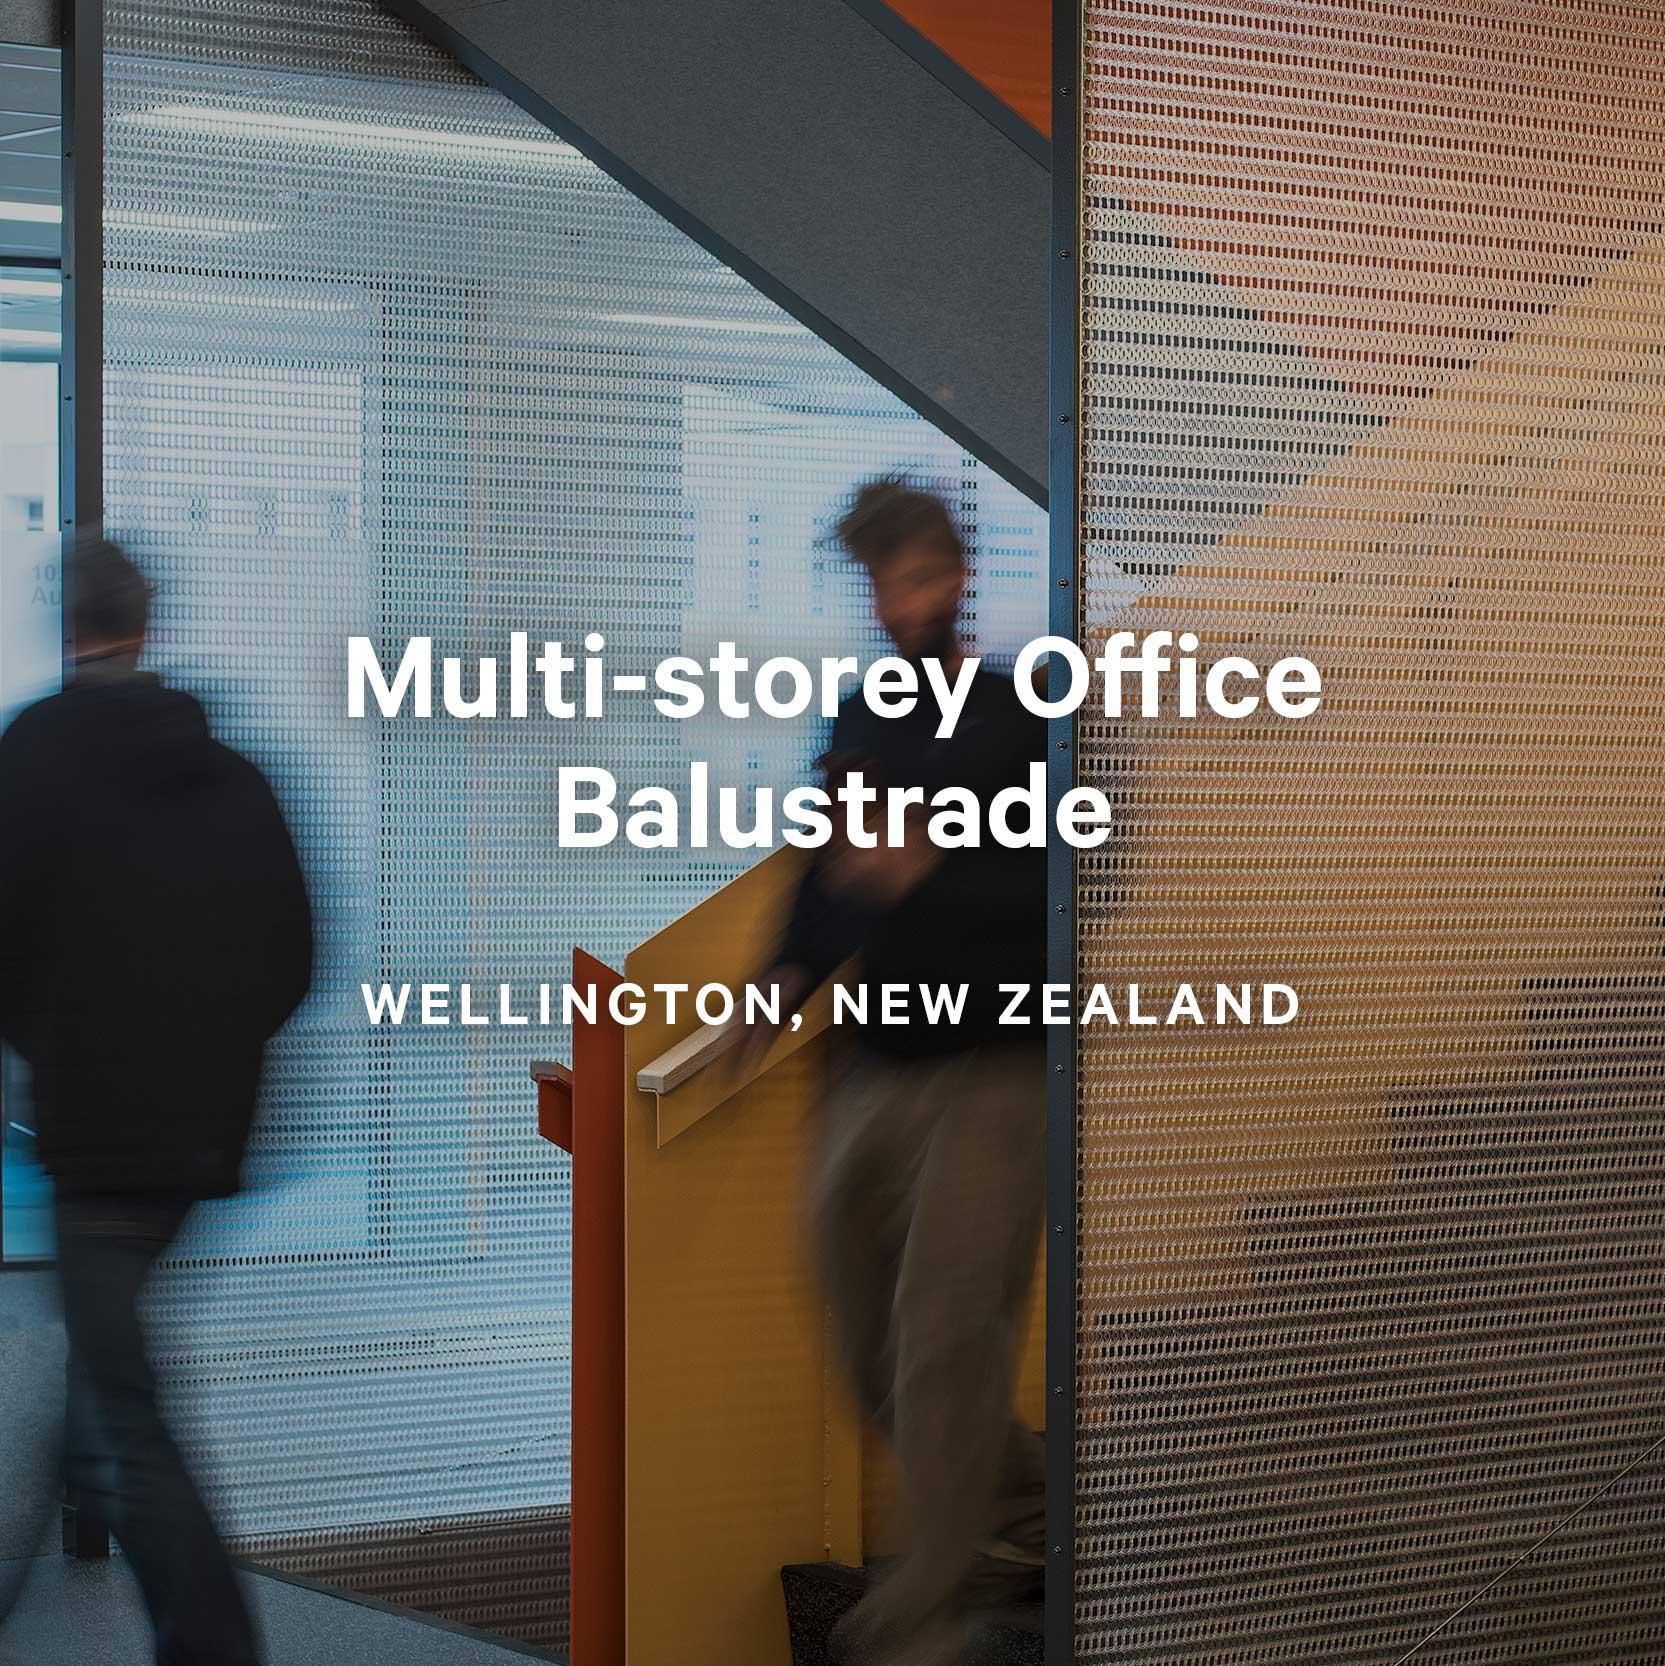 Multi-storey Office Balustrade